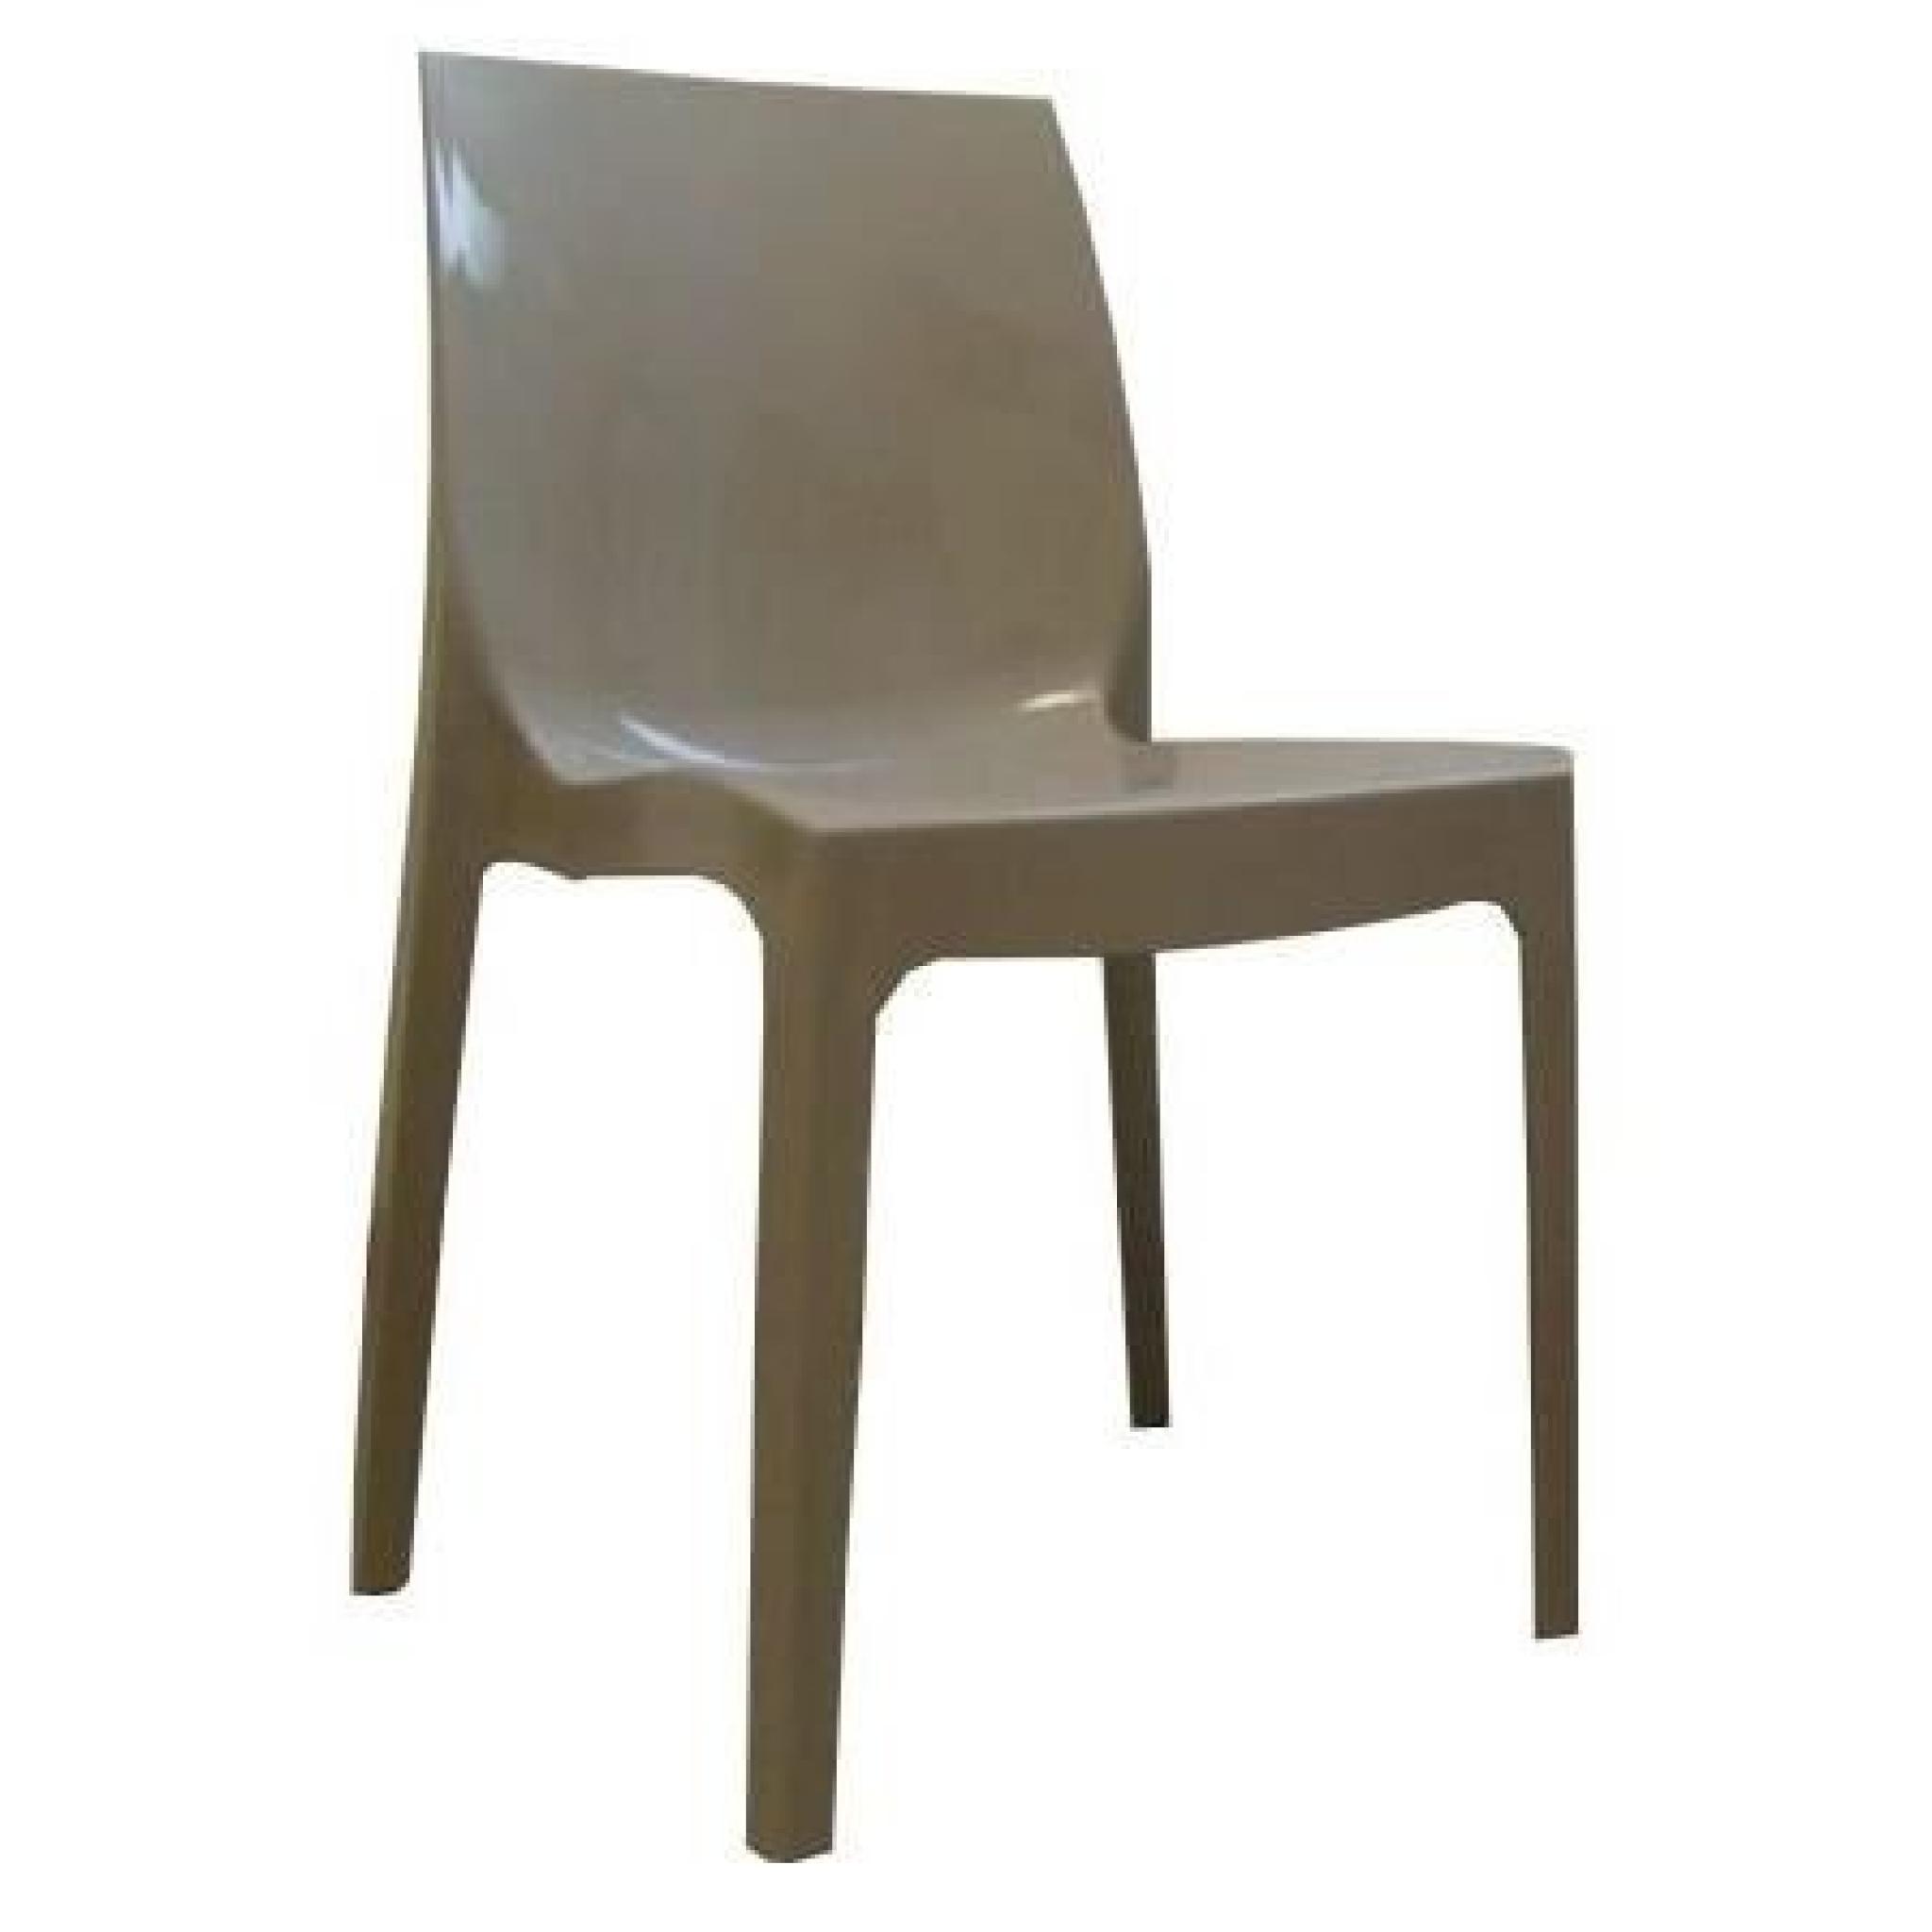 chaises empilables pas cher stunning lot de chaises haut de gamme falena empilable pas cher. Black Bedroom Furniture Sets. Home Design Ideas